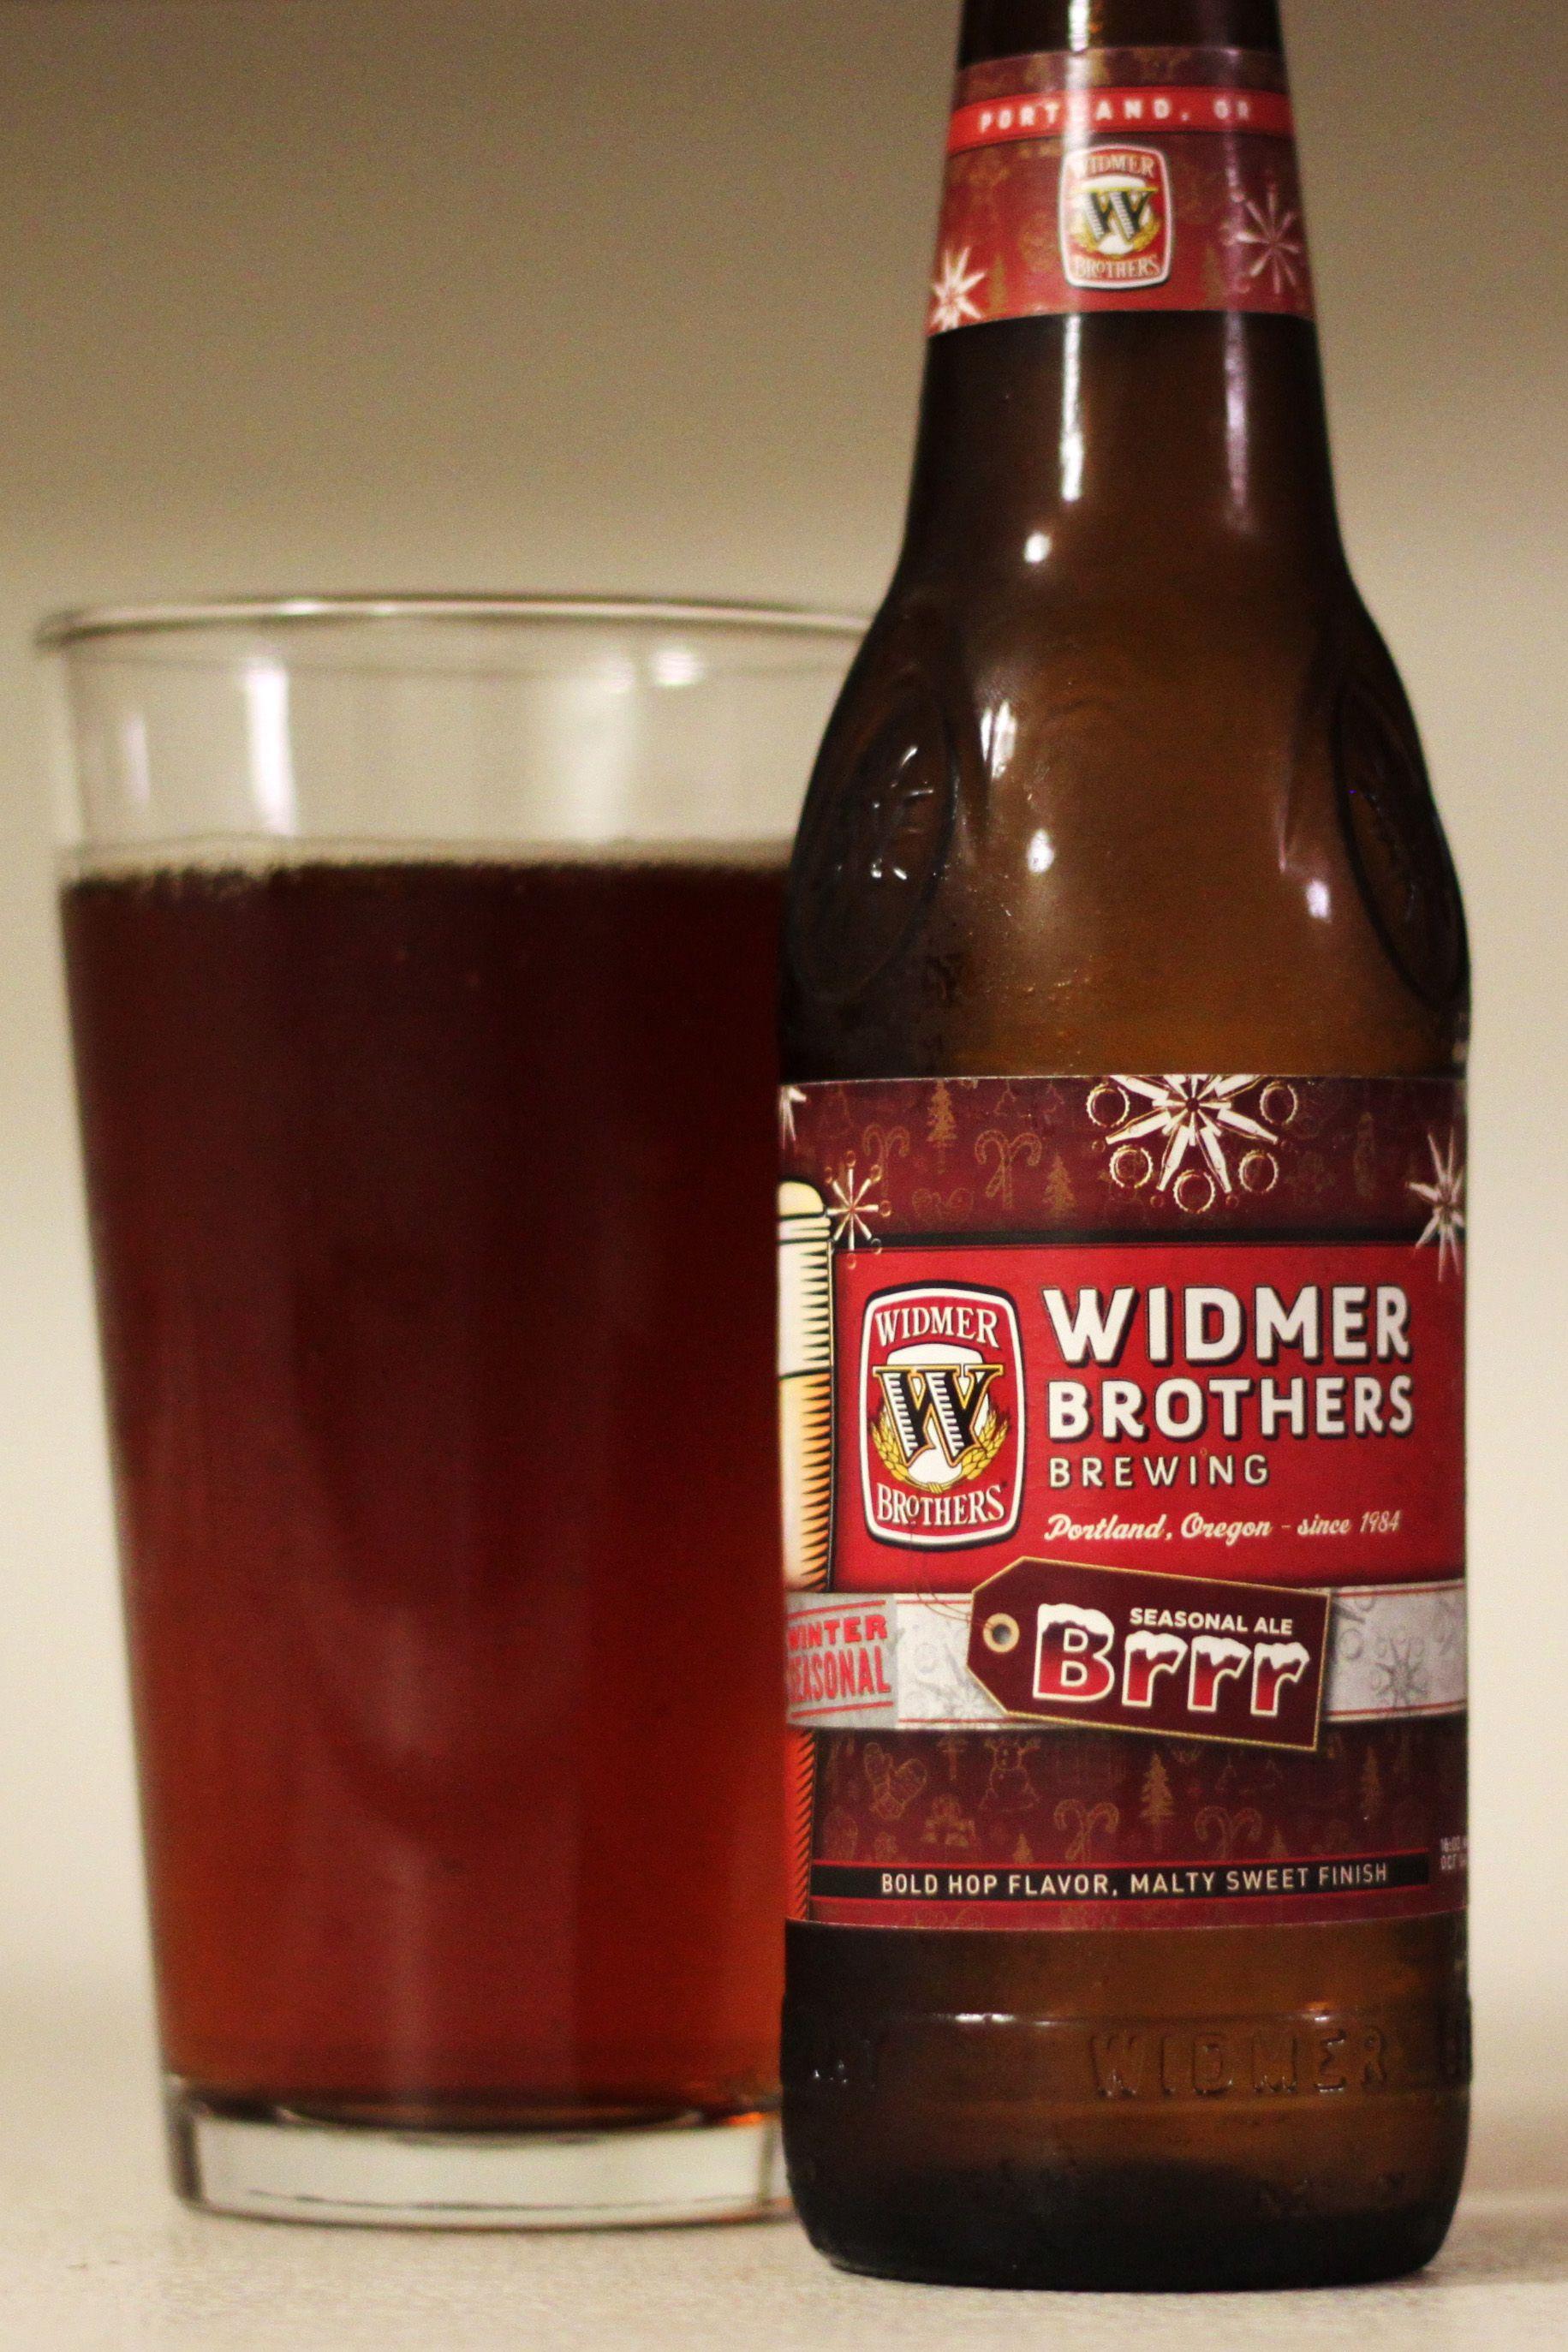 Widmer Brothers Brrr Seasonal Ale | Winter Red Ale | 7.2% ABV | Portland, Oregon